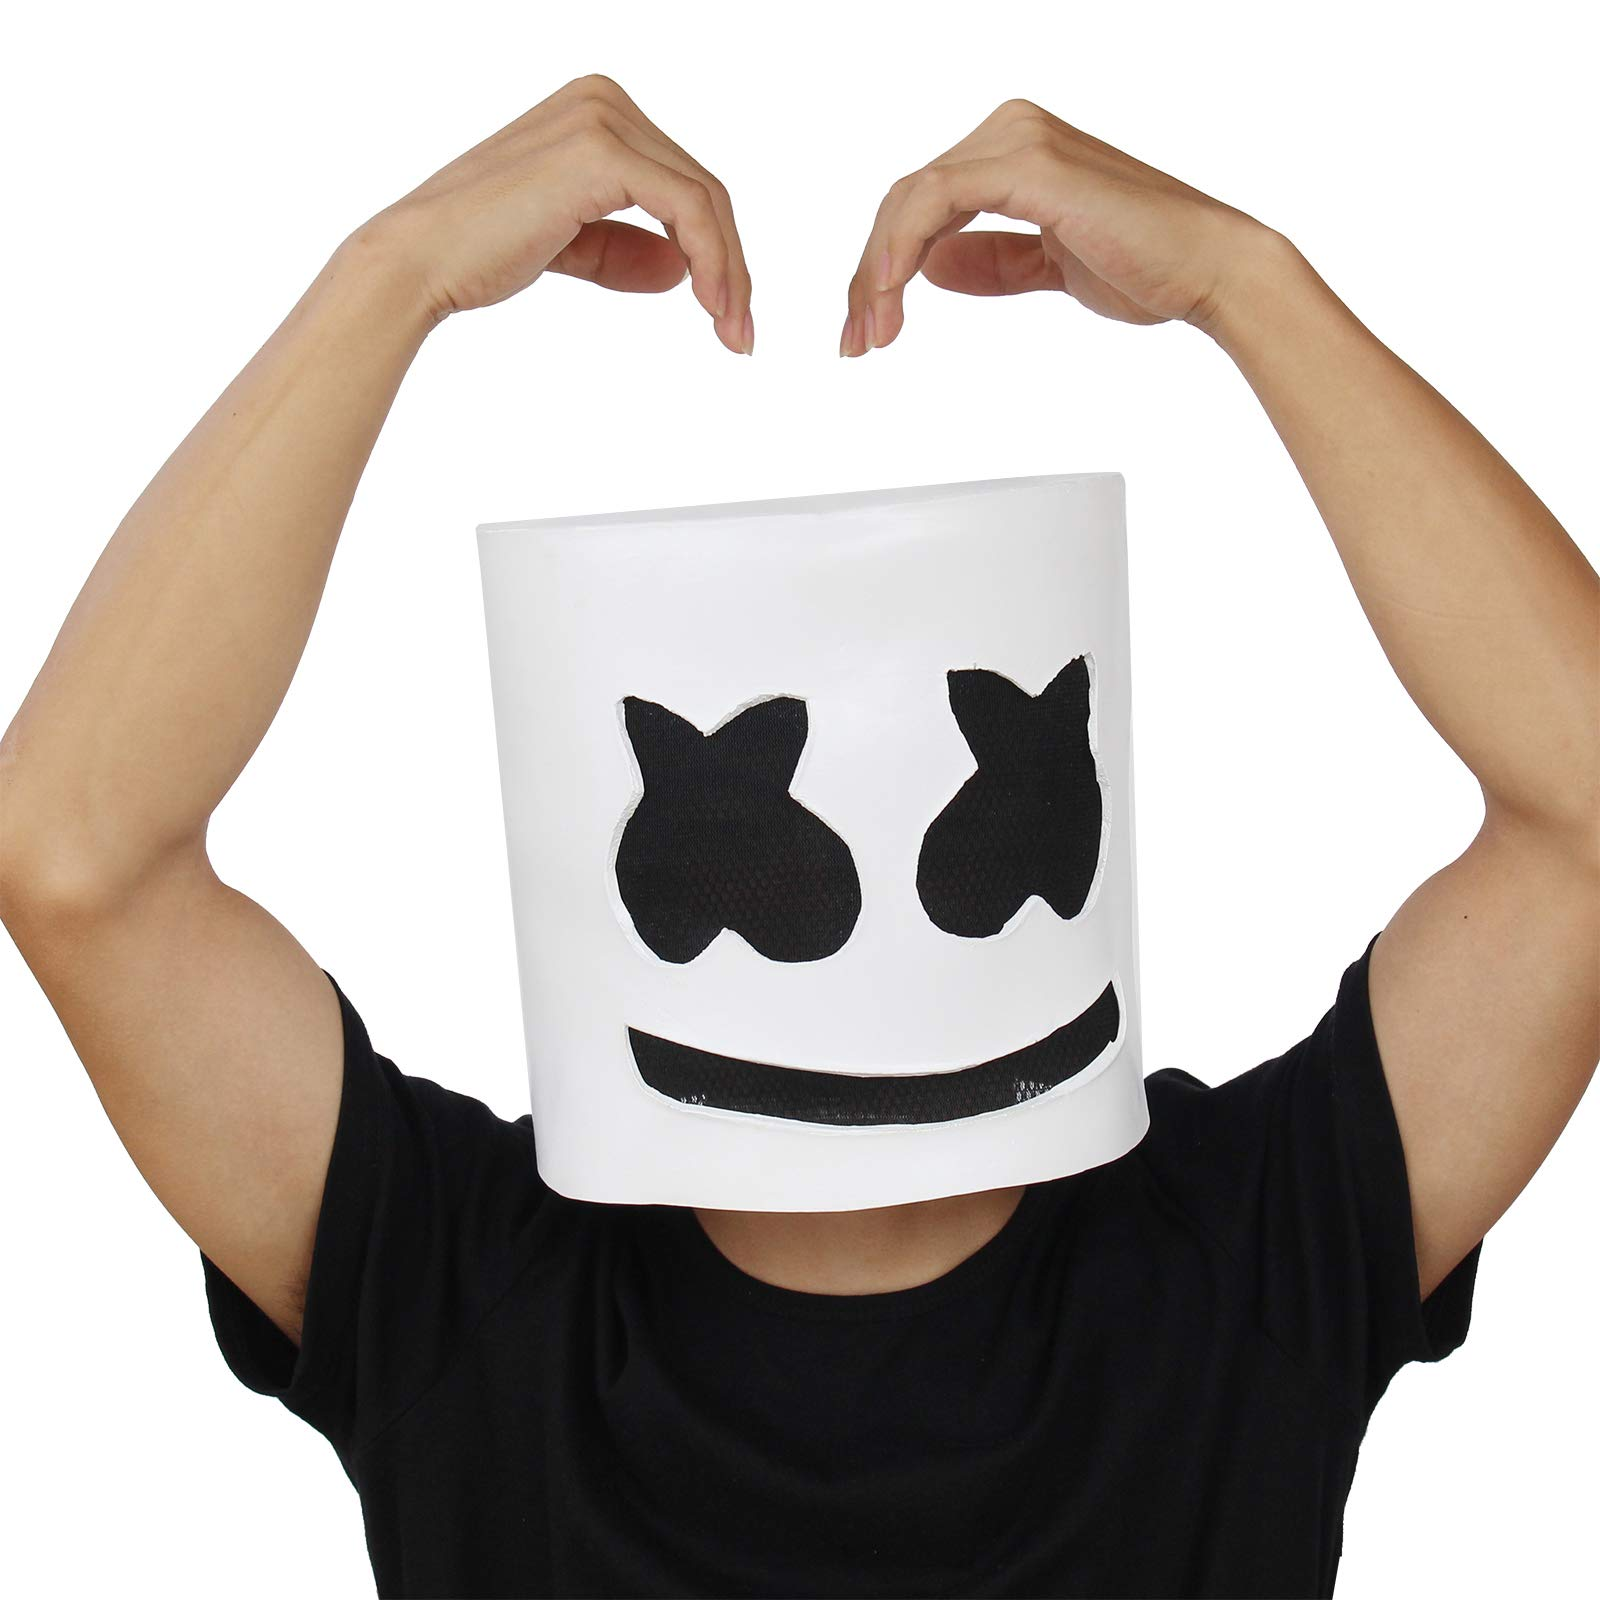 PartyHop DJ Mask Music Festival Helmet Halloween Party Cosplay Props Latex Full Head Mask